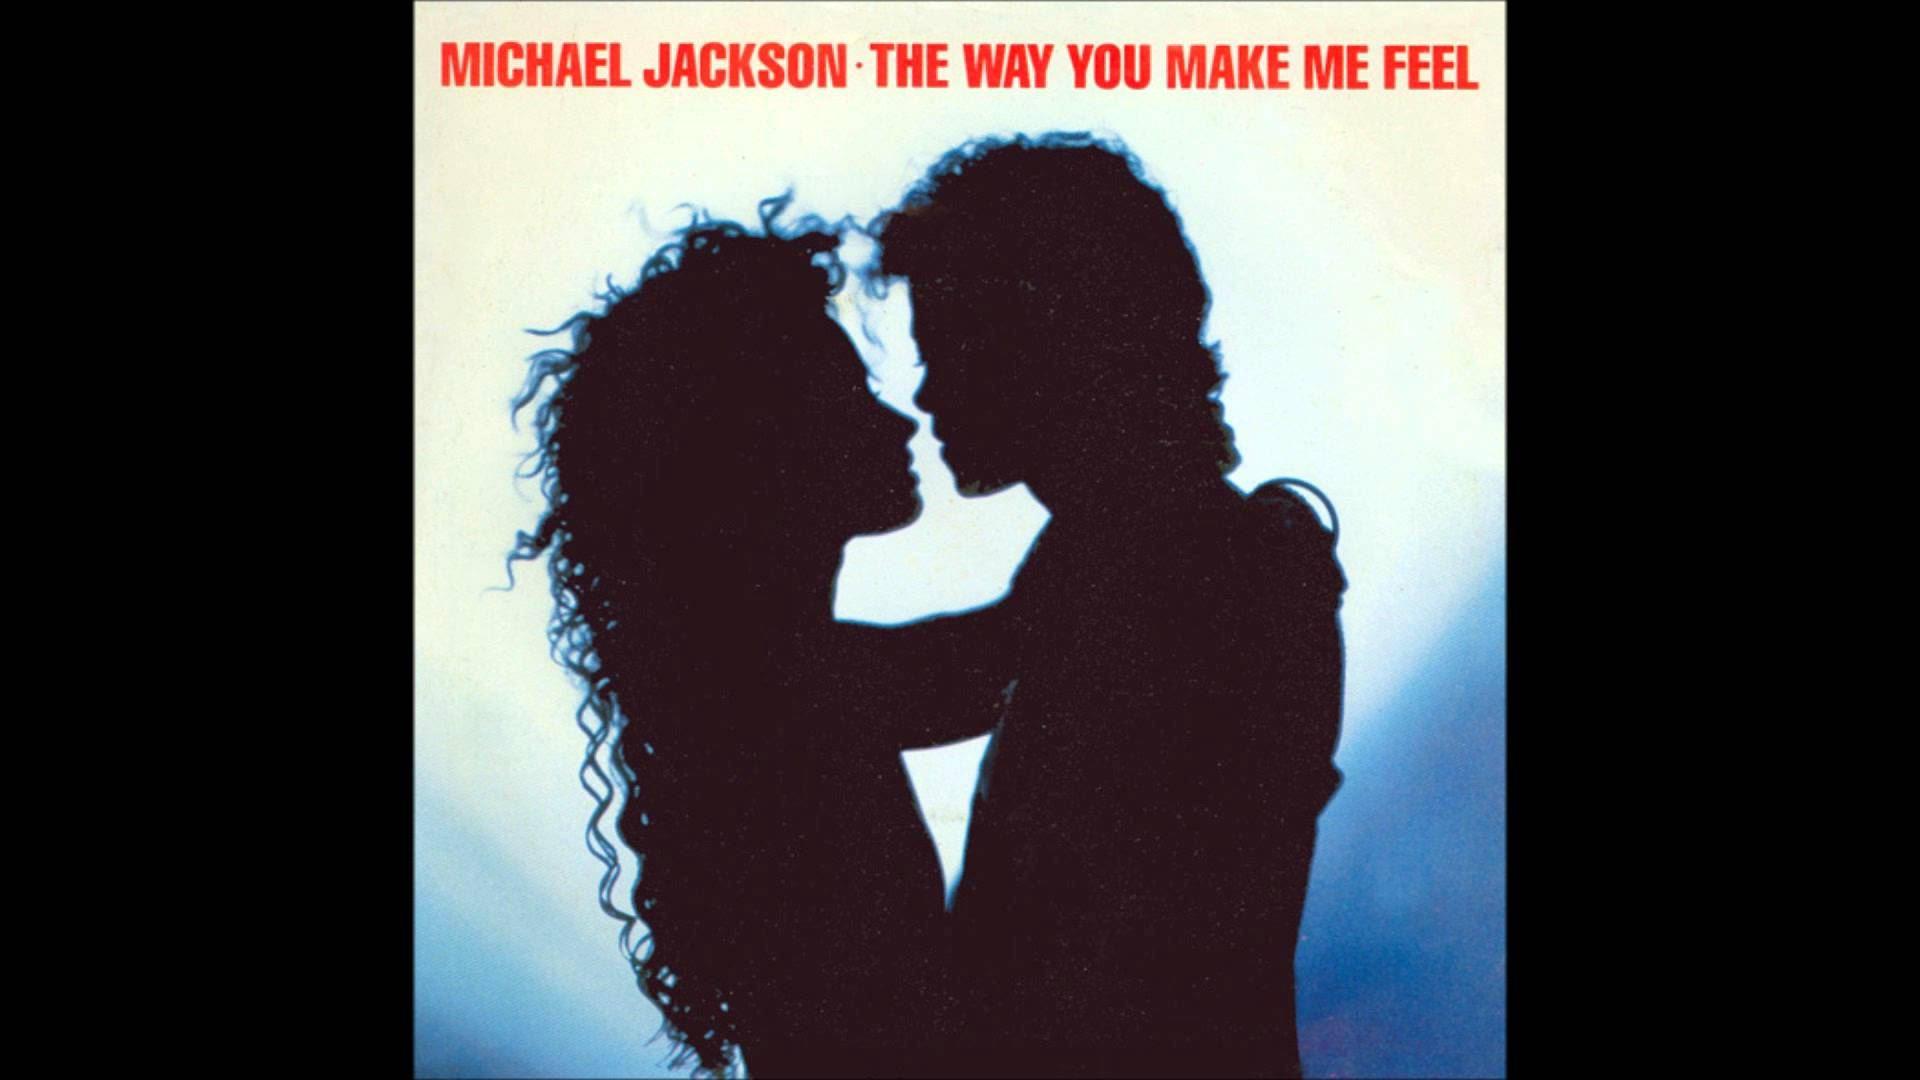 mj-the-way-you-make-me-feel